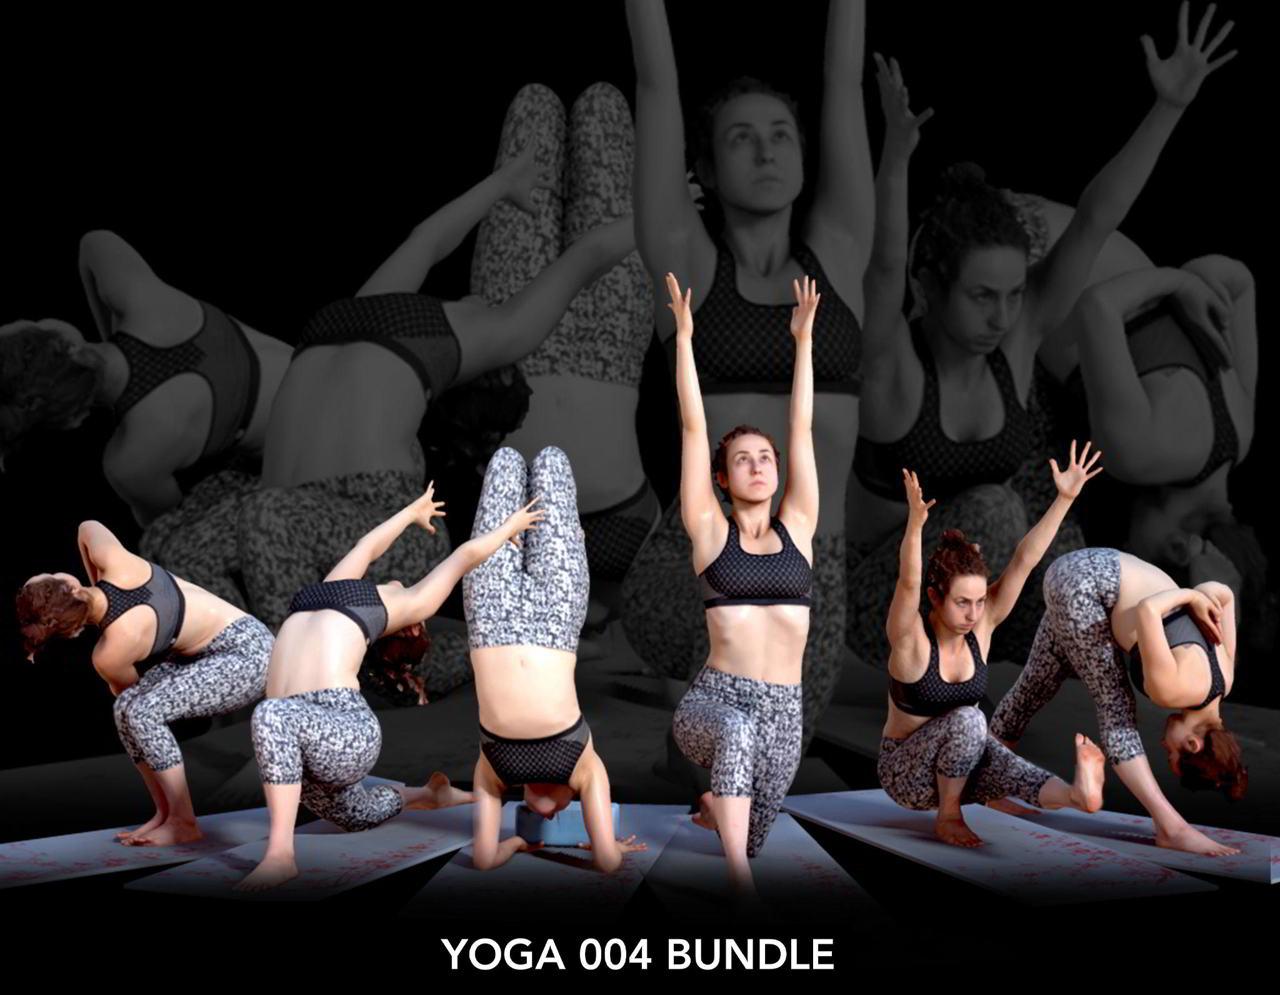 Human Engine - Yoga 004 Bundle free download